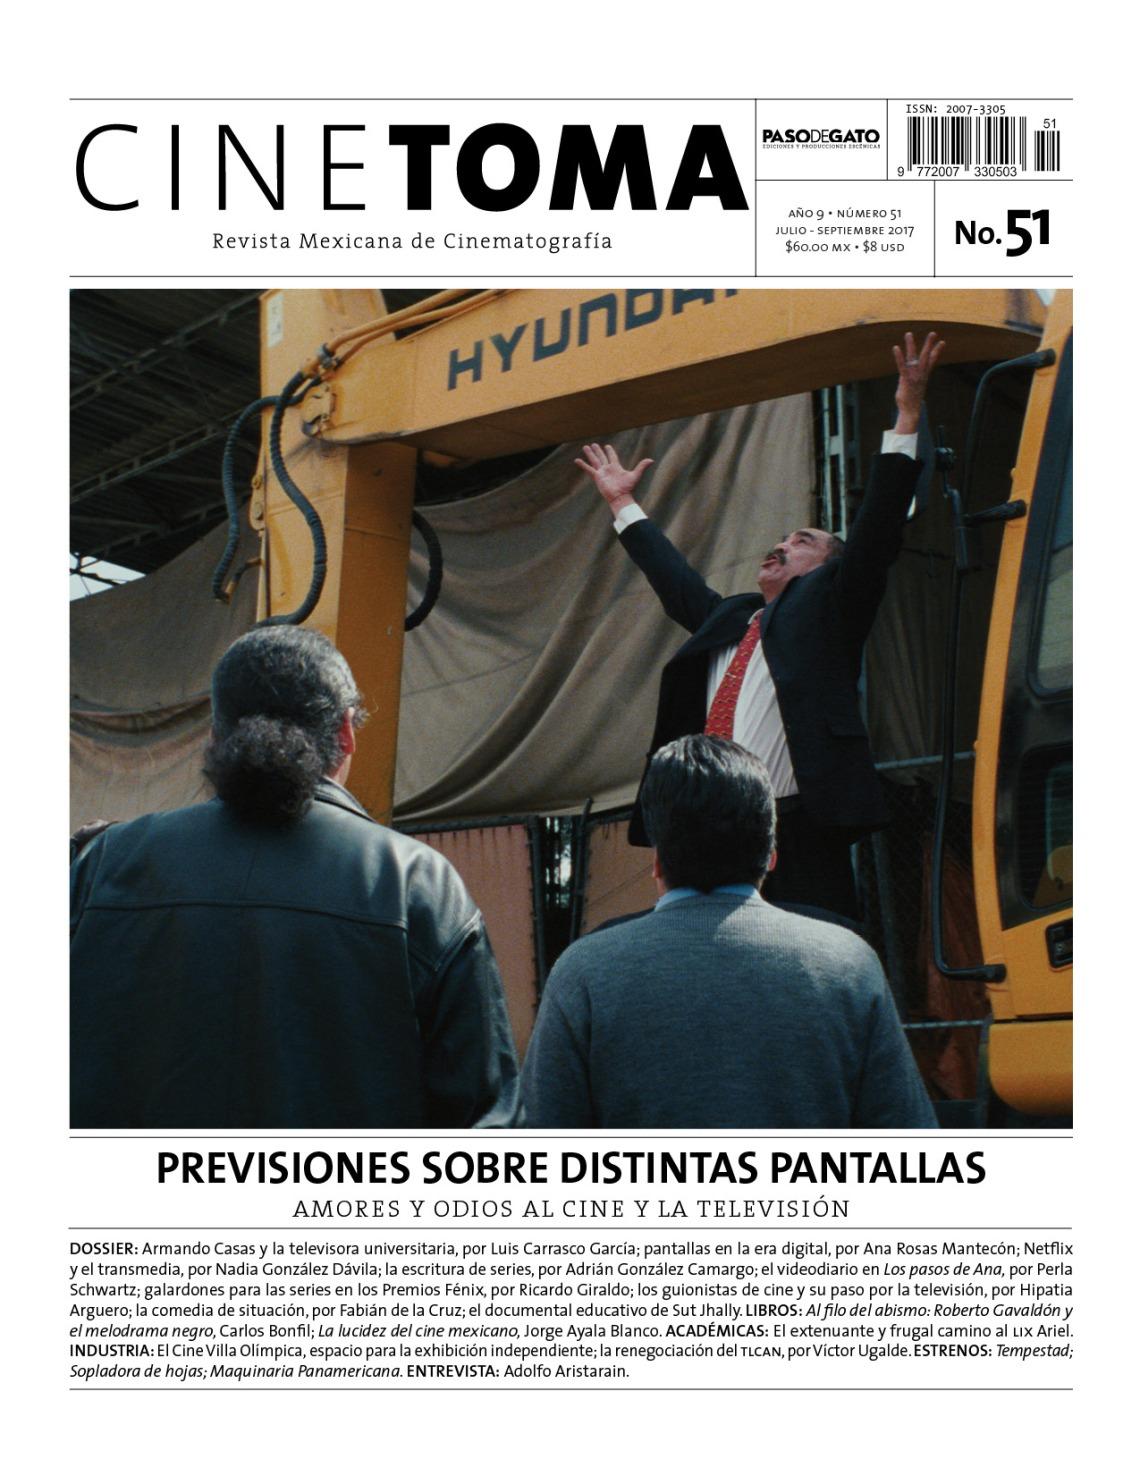 CINE TOMA 51_Portada_media